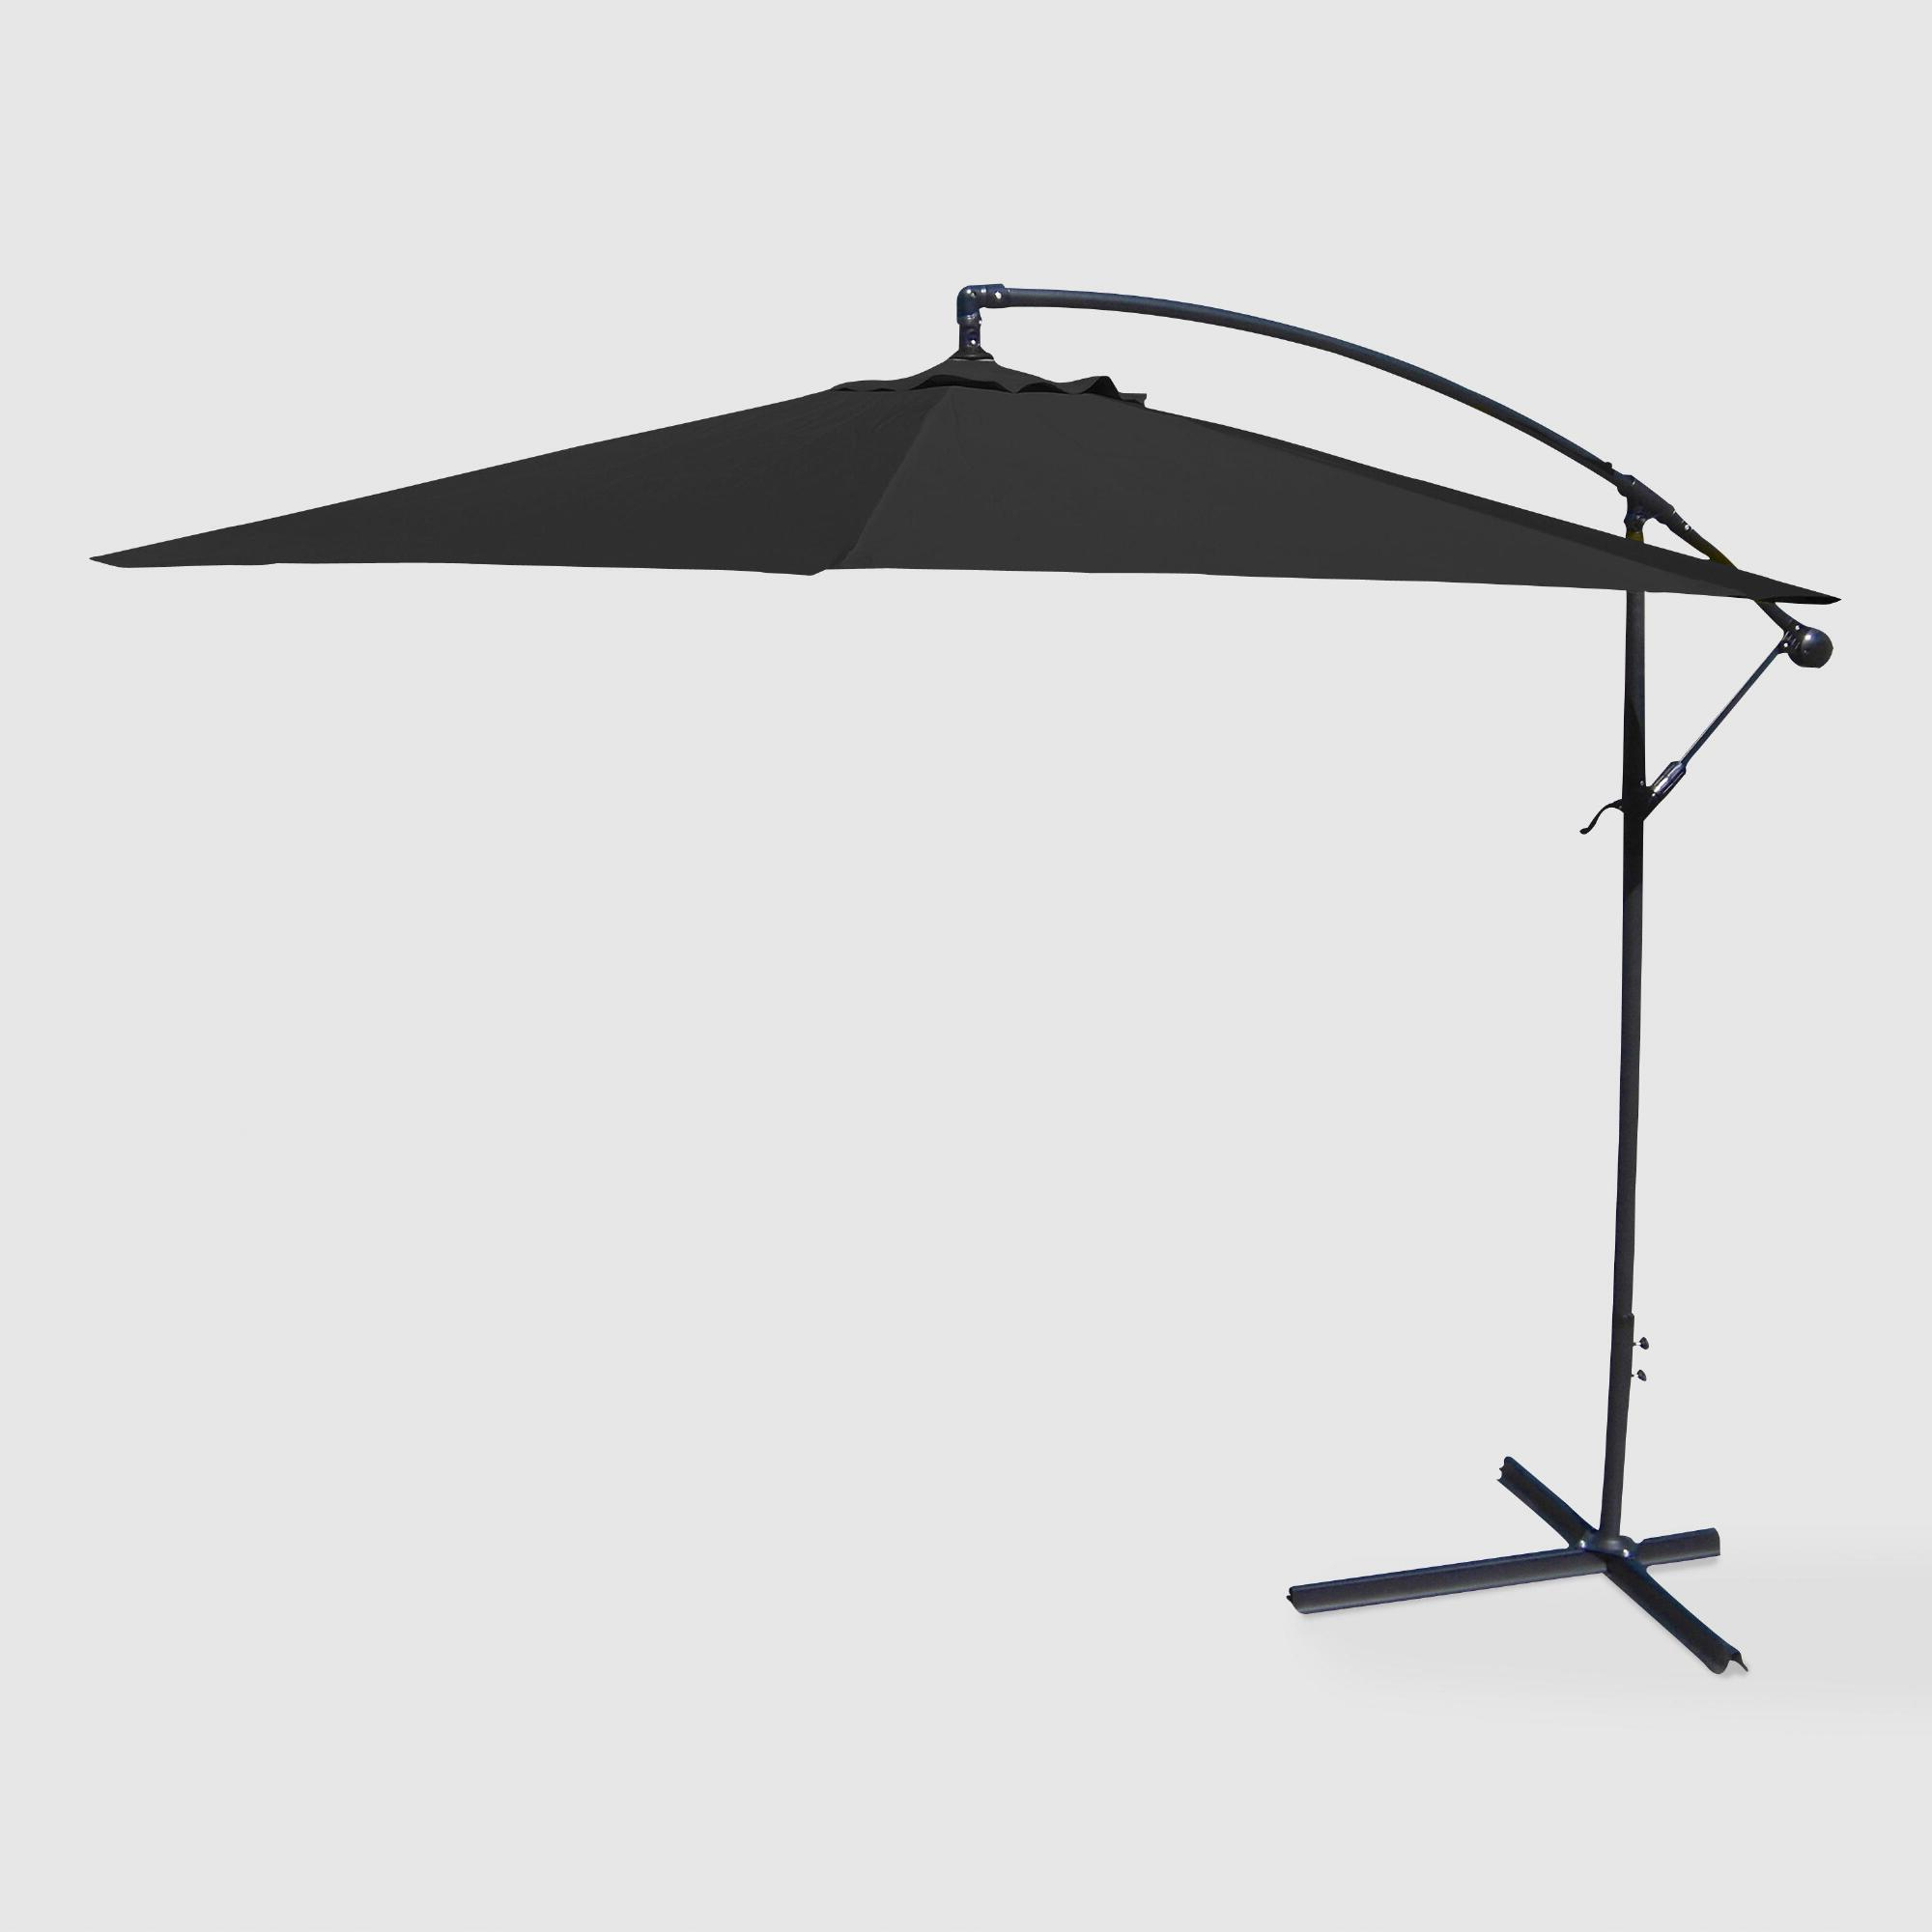 2020 Wardingham Square Cantilever Umbrellas Intended For Black Cantilever Outdoor Patio Umbrella – Fabricworld Market In (View 1 of 20)